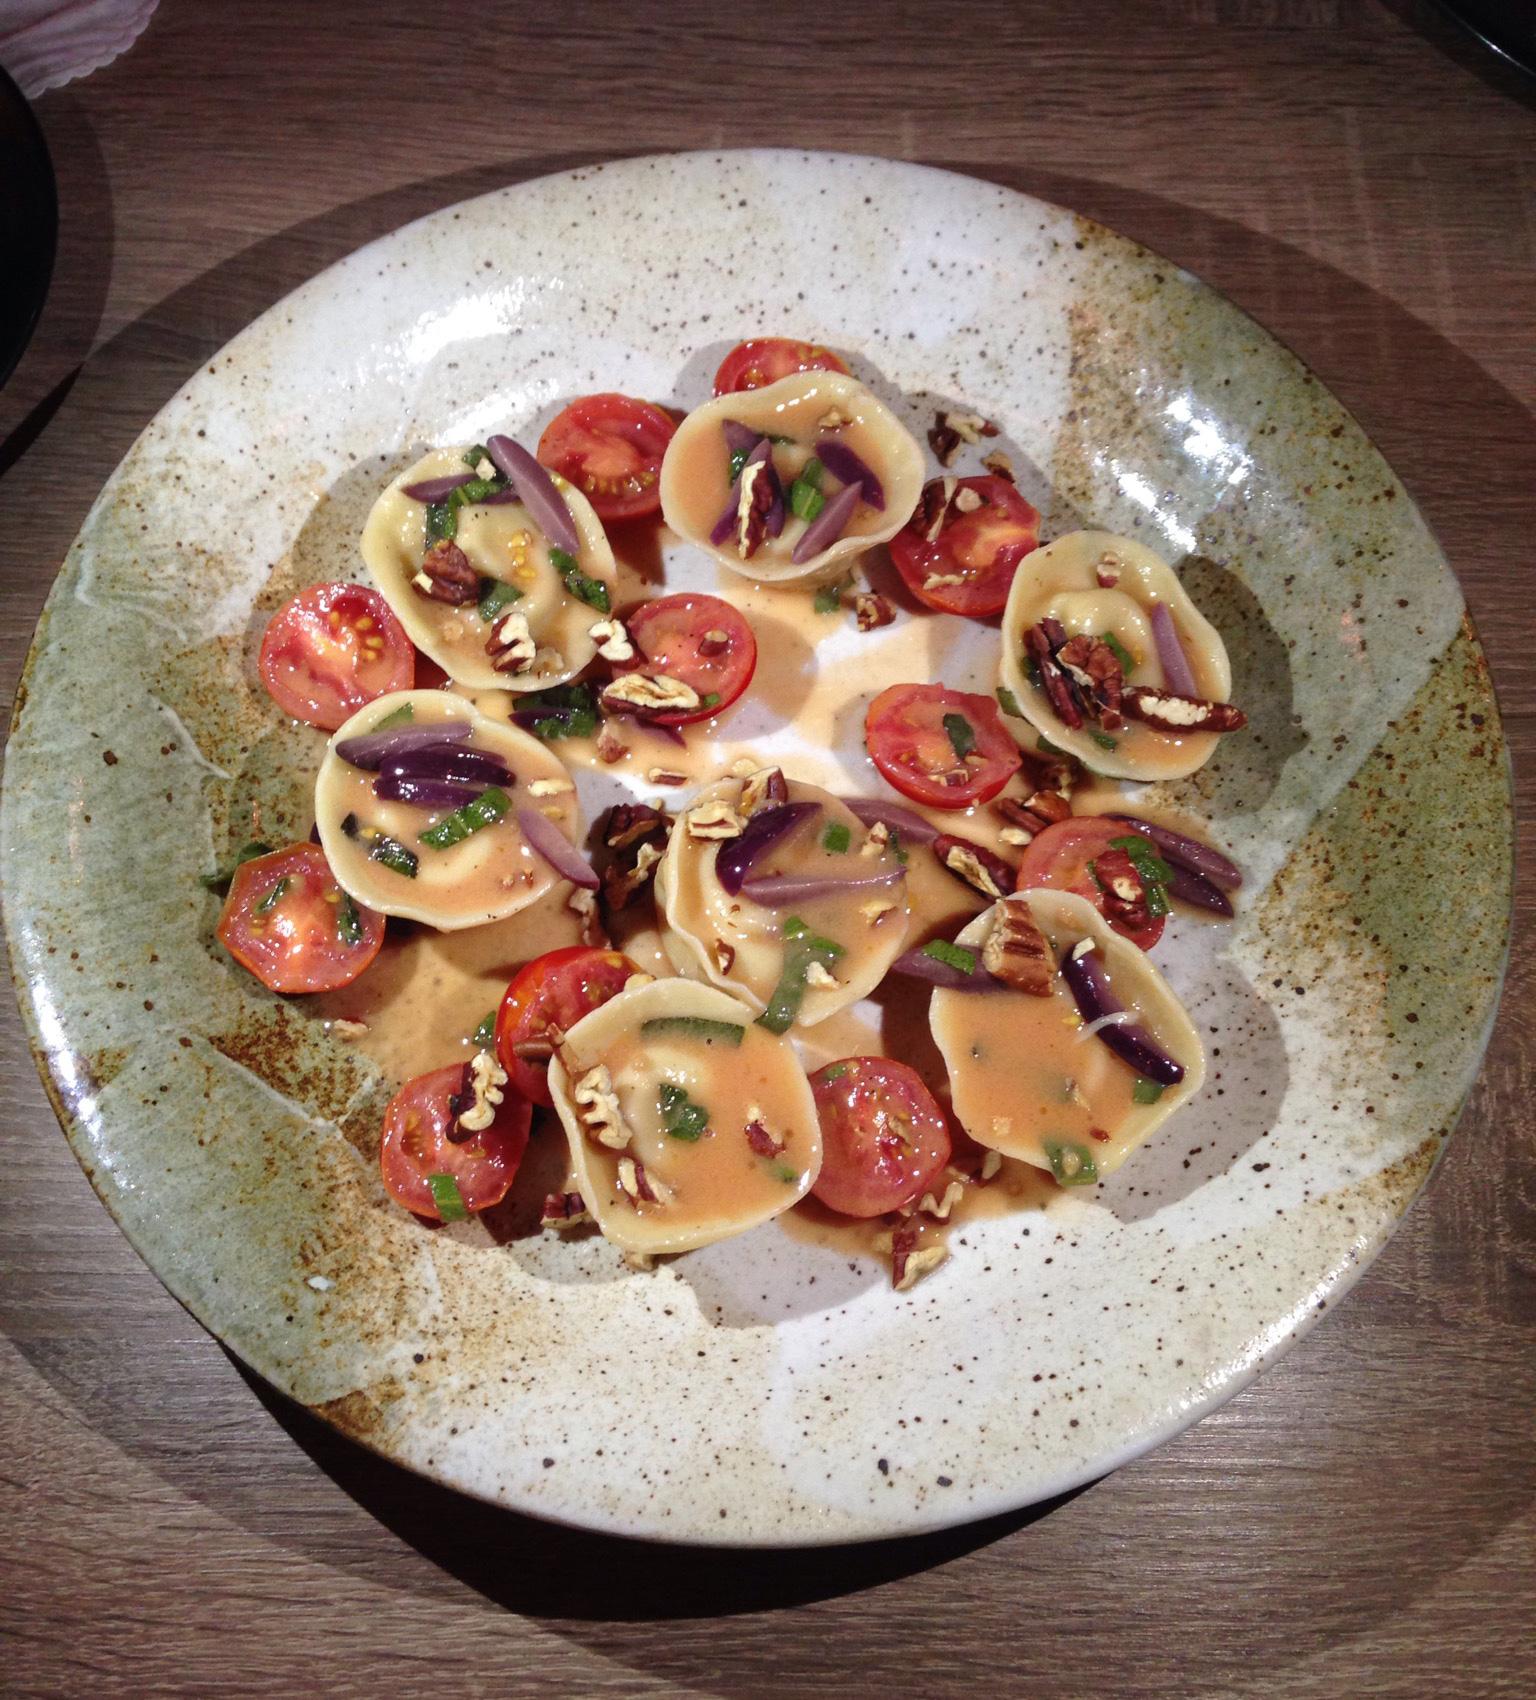 aji-de-gallina-tortelini-1111-peruvian-bistro